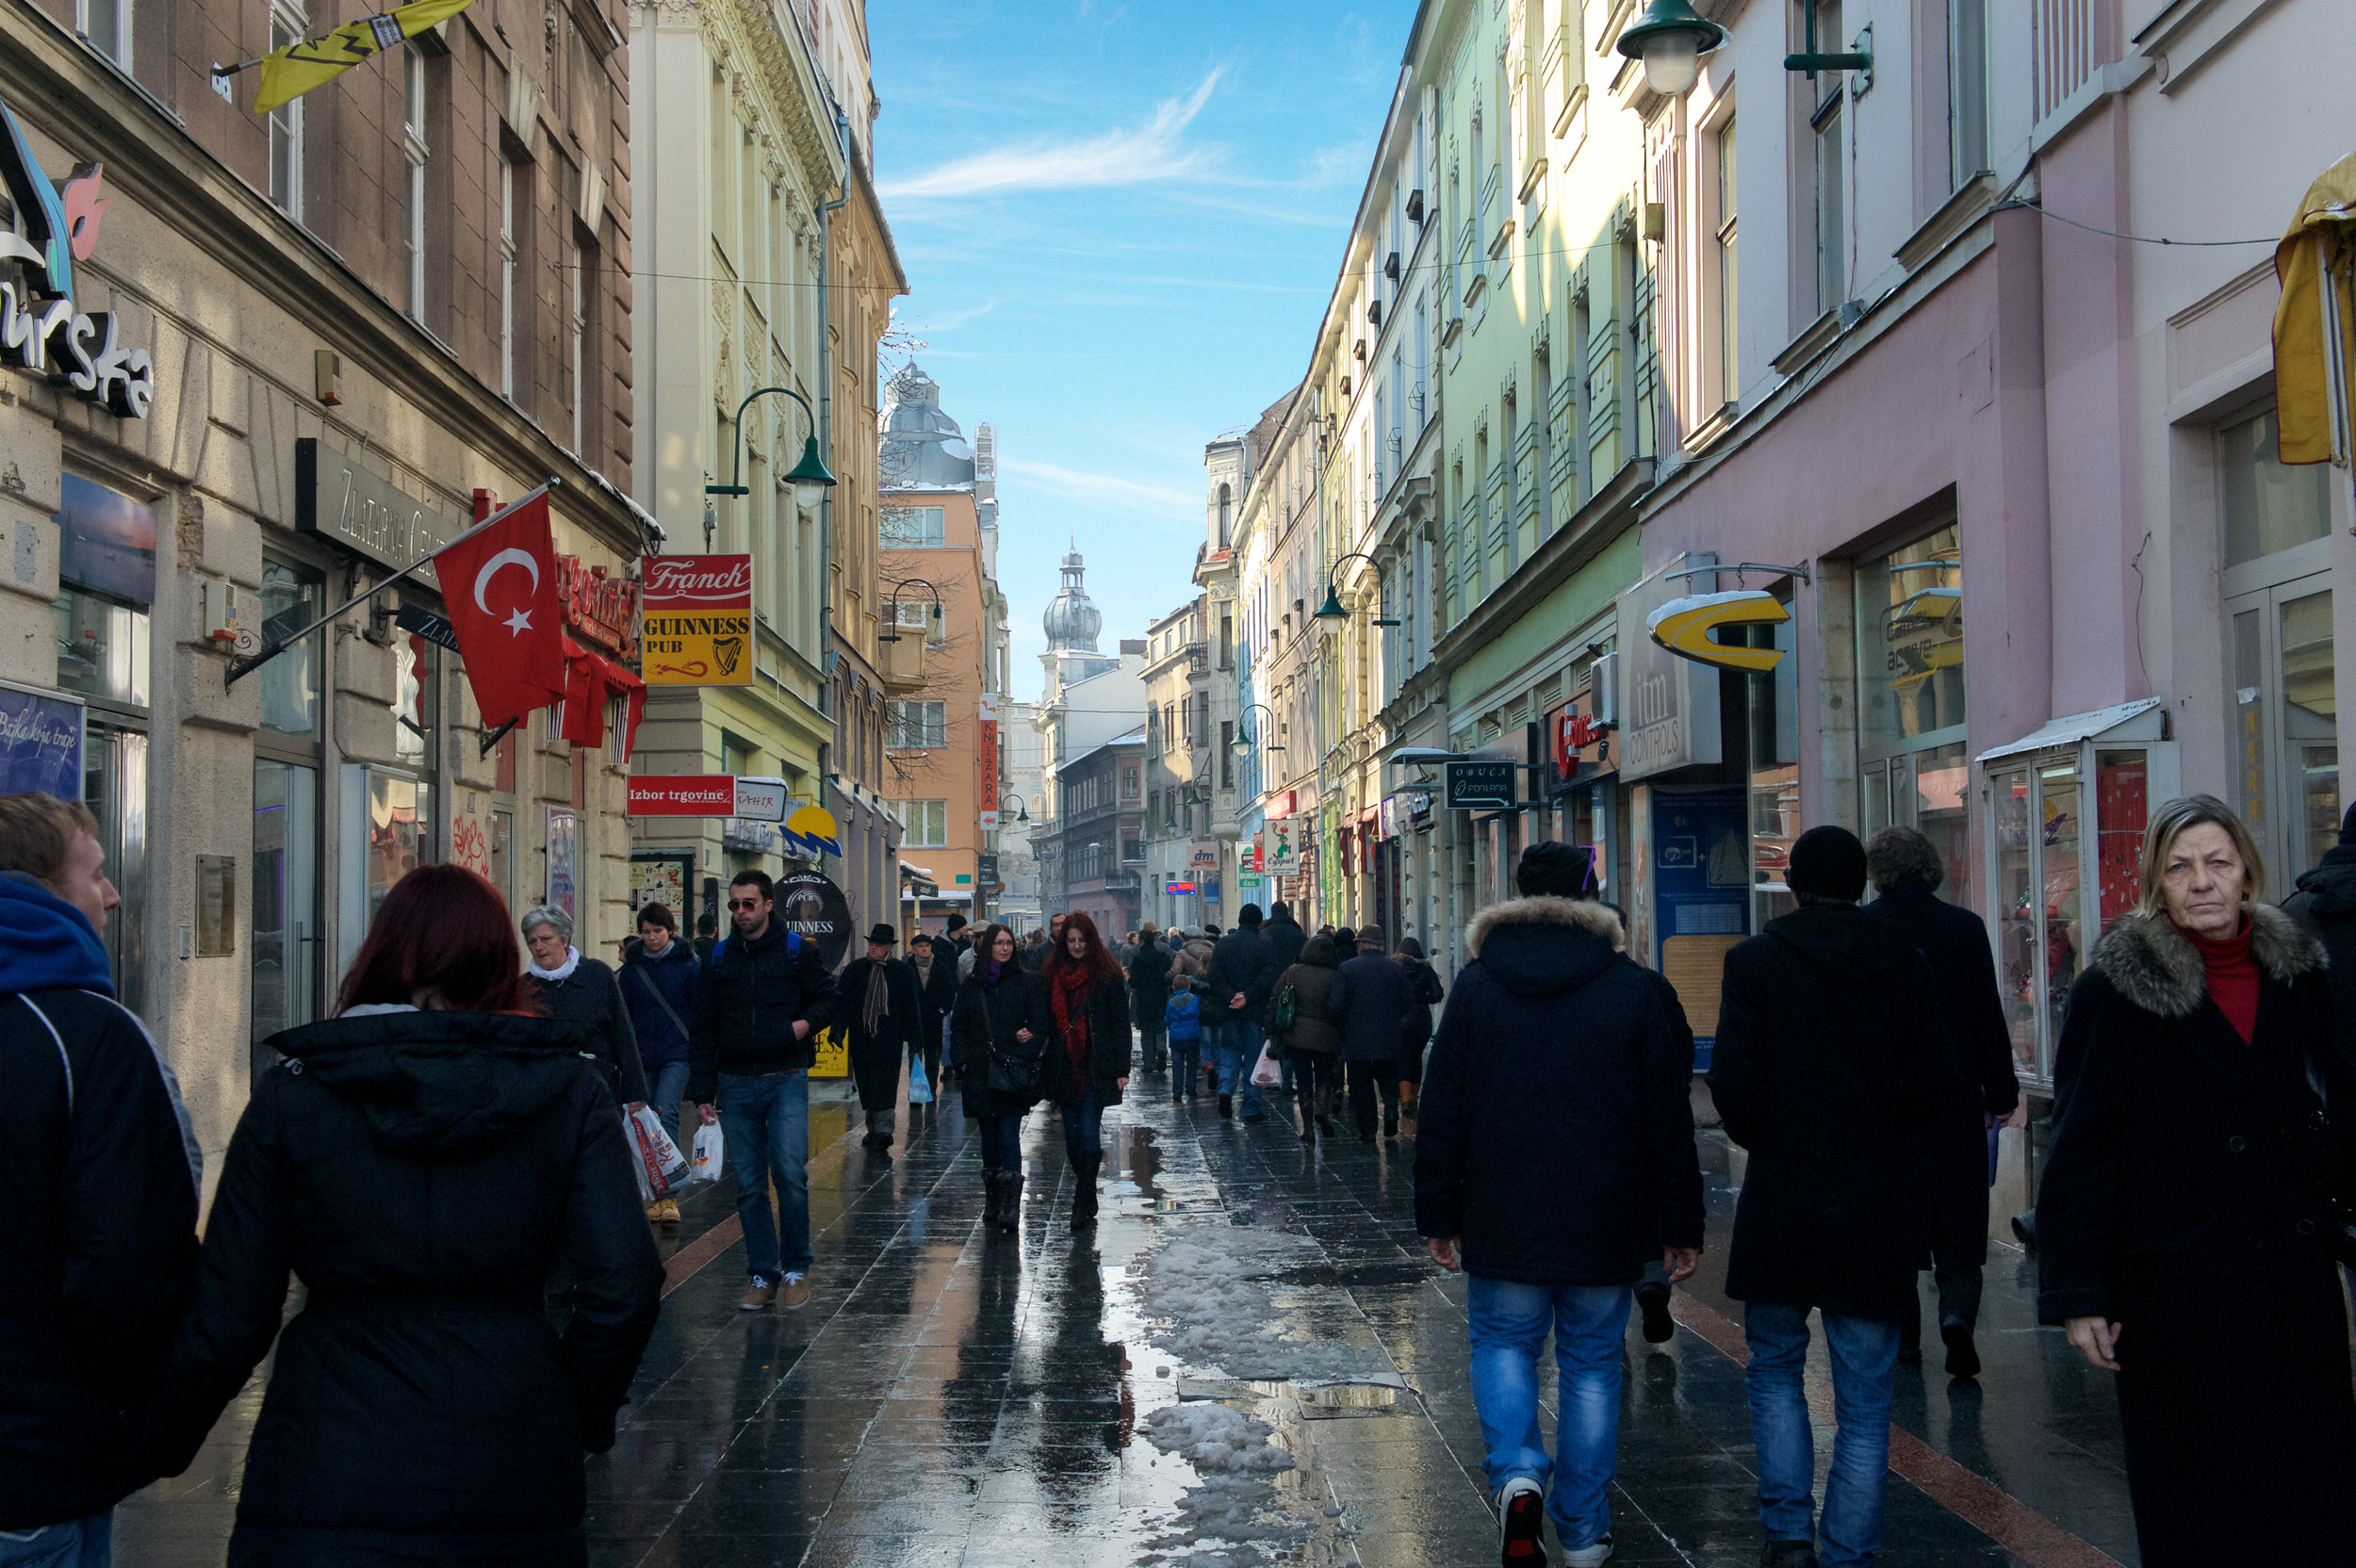 Ferhadija, Sarajevos main shopping and entertainment district.